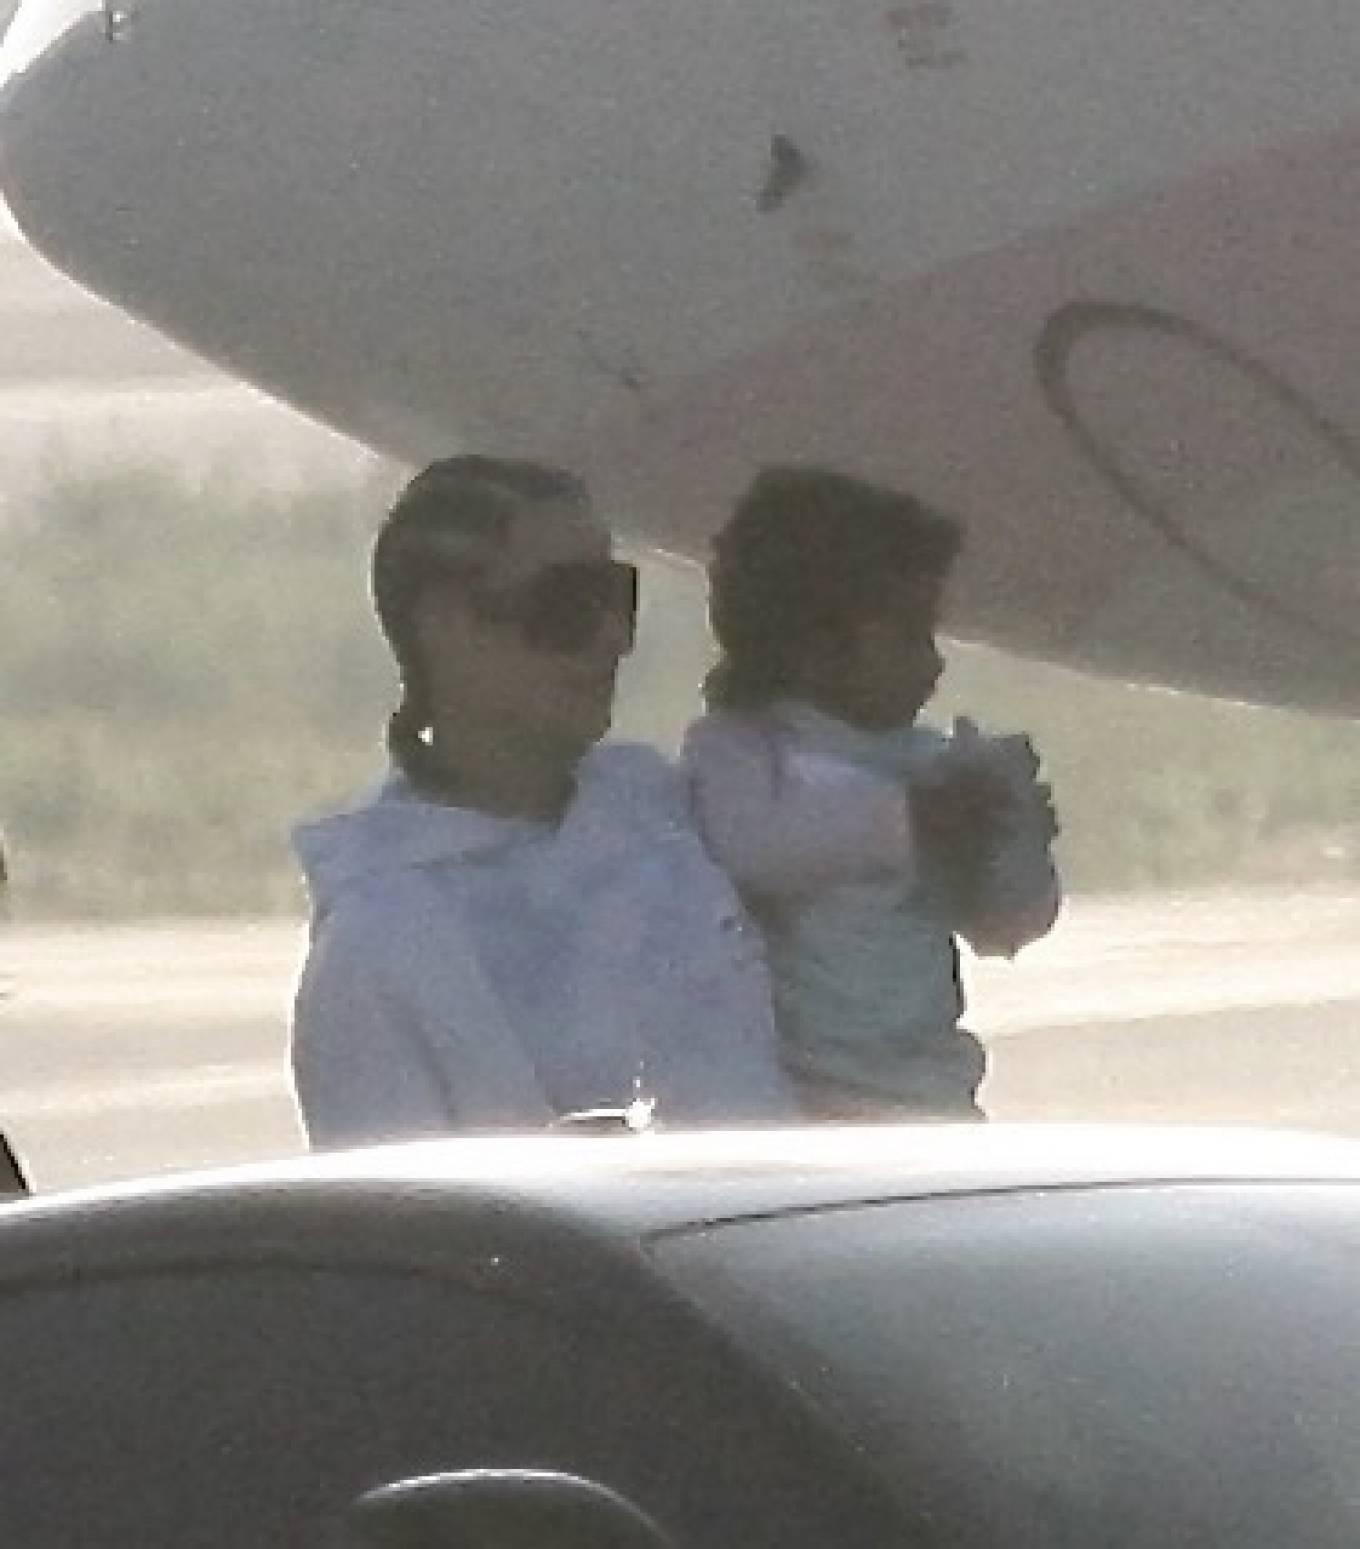 Khloe Kardashian 2020 : Khloe Kardashian and Kourtney Kardashian – Pictured boarding Kylie Jenners private jet in Van Nuys-14